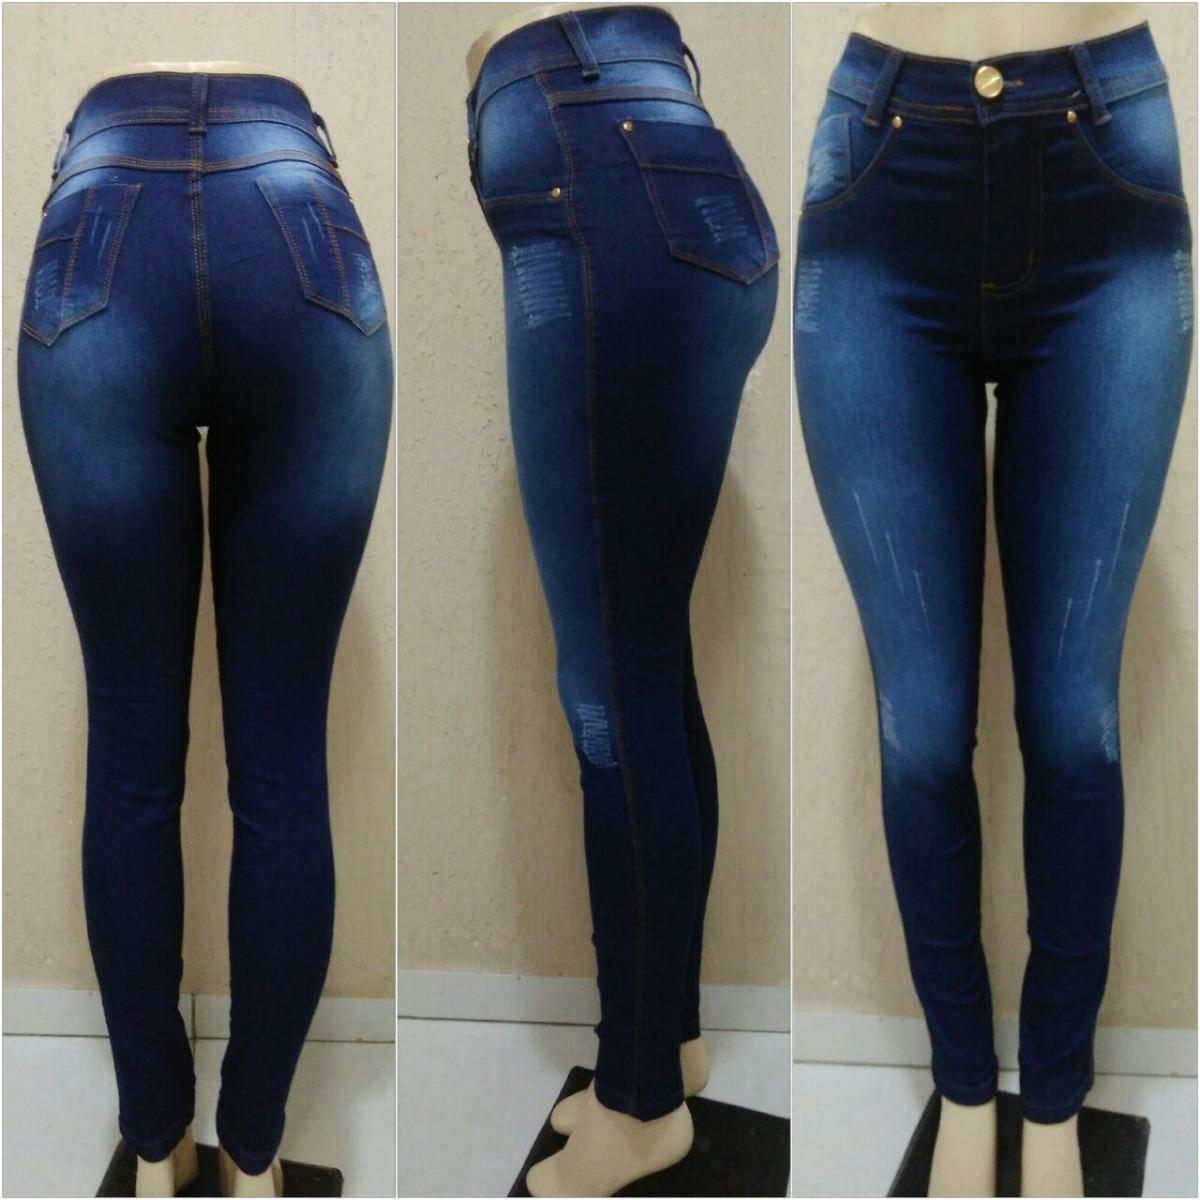 b972108bfc 4 kit 2 calça jeans feminina cintura plus size atacado c lycra. Carregando  zoom.